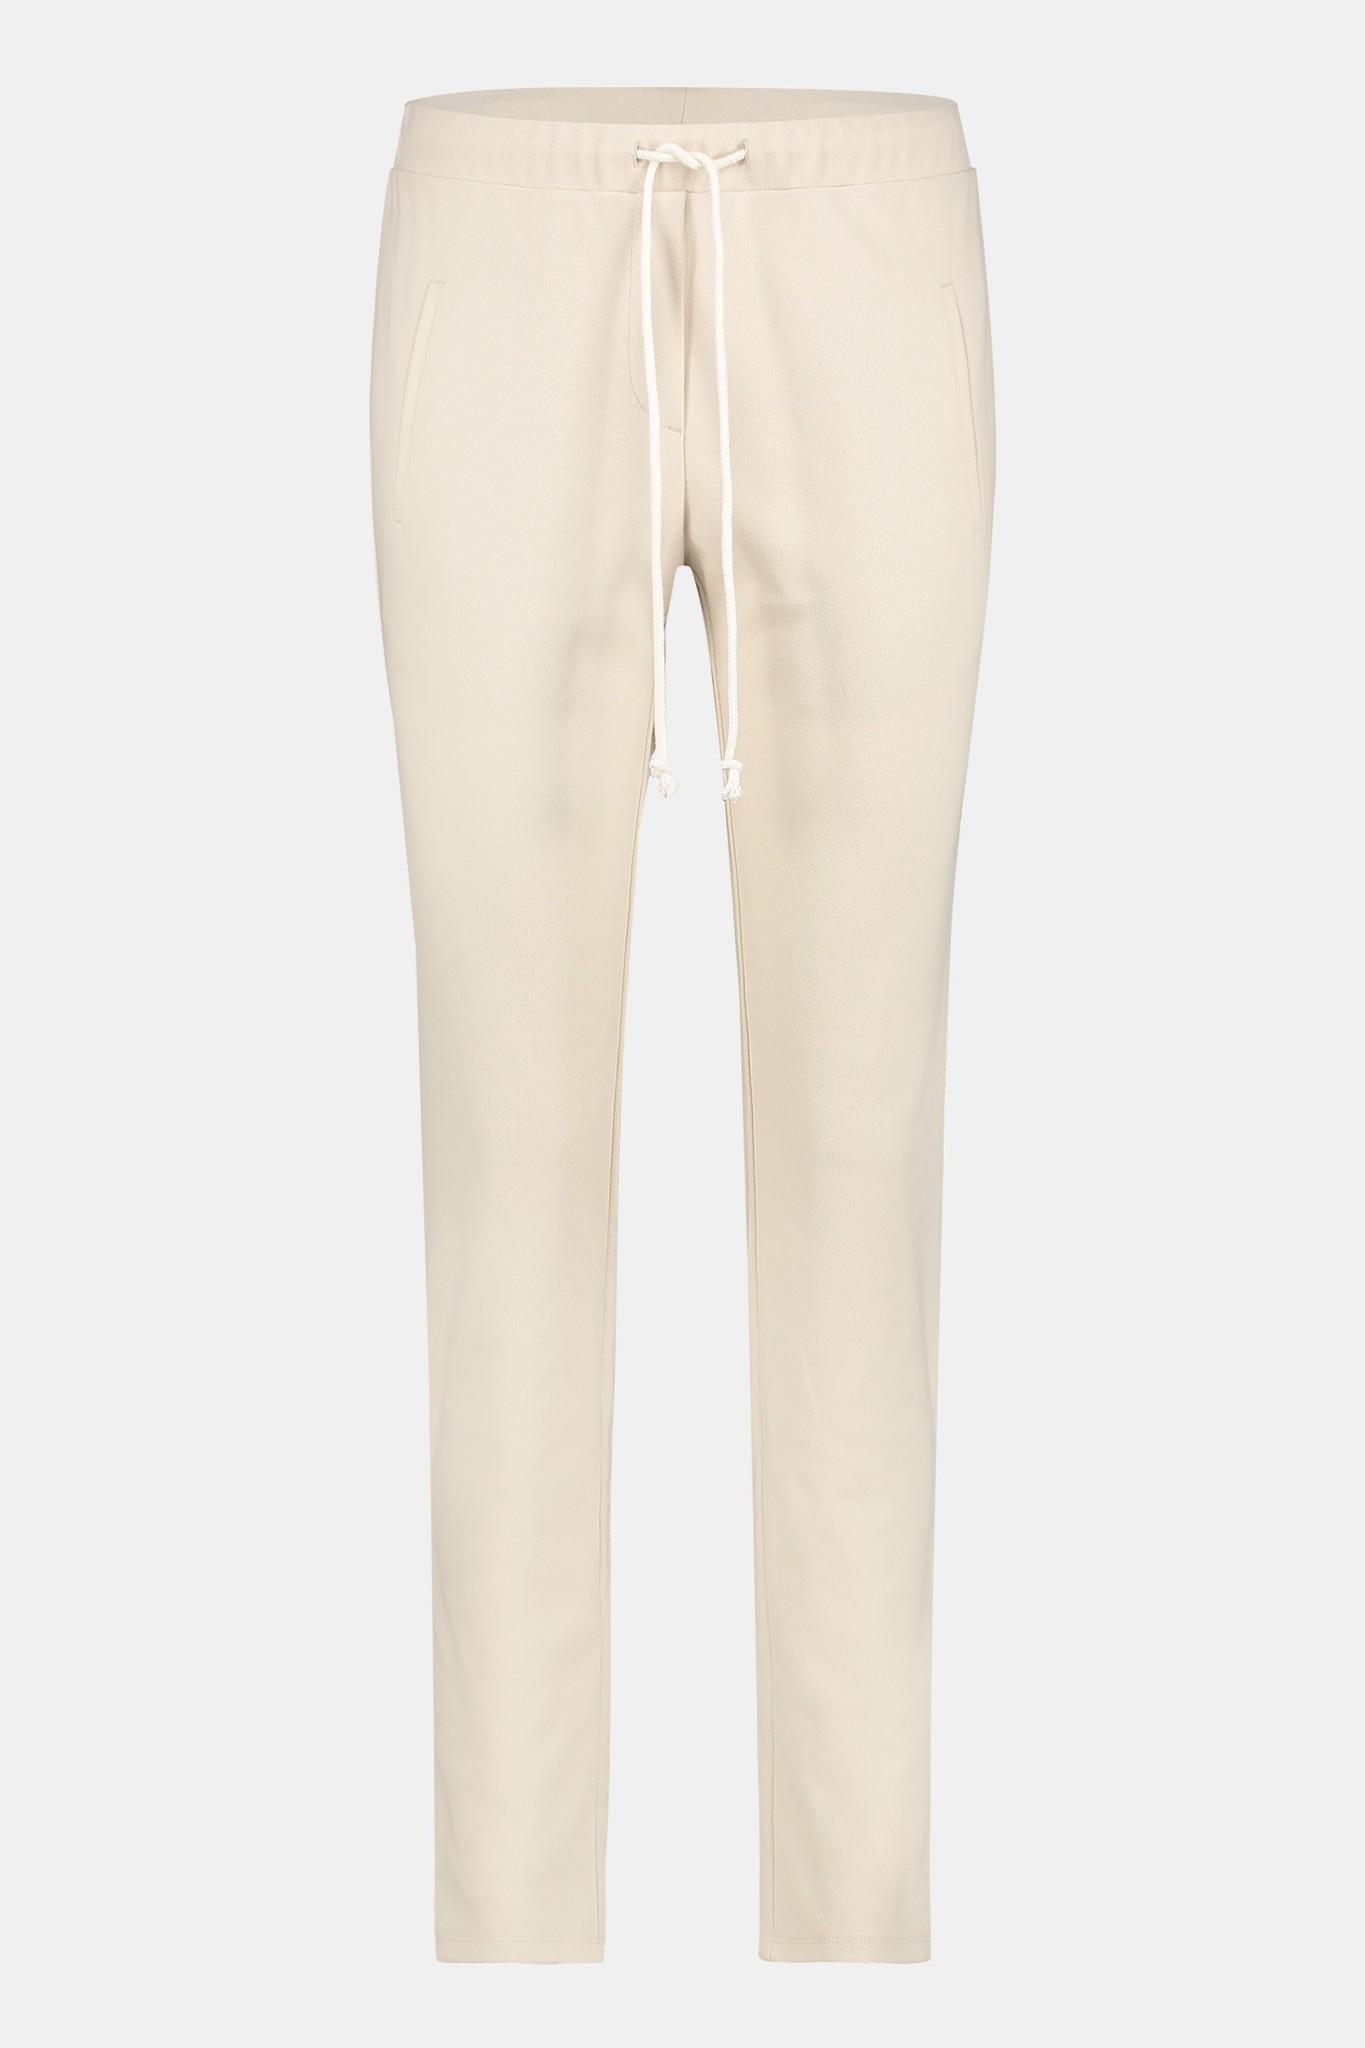 Penn & Ink Trousers W21N1028-144-1